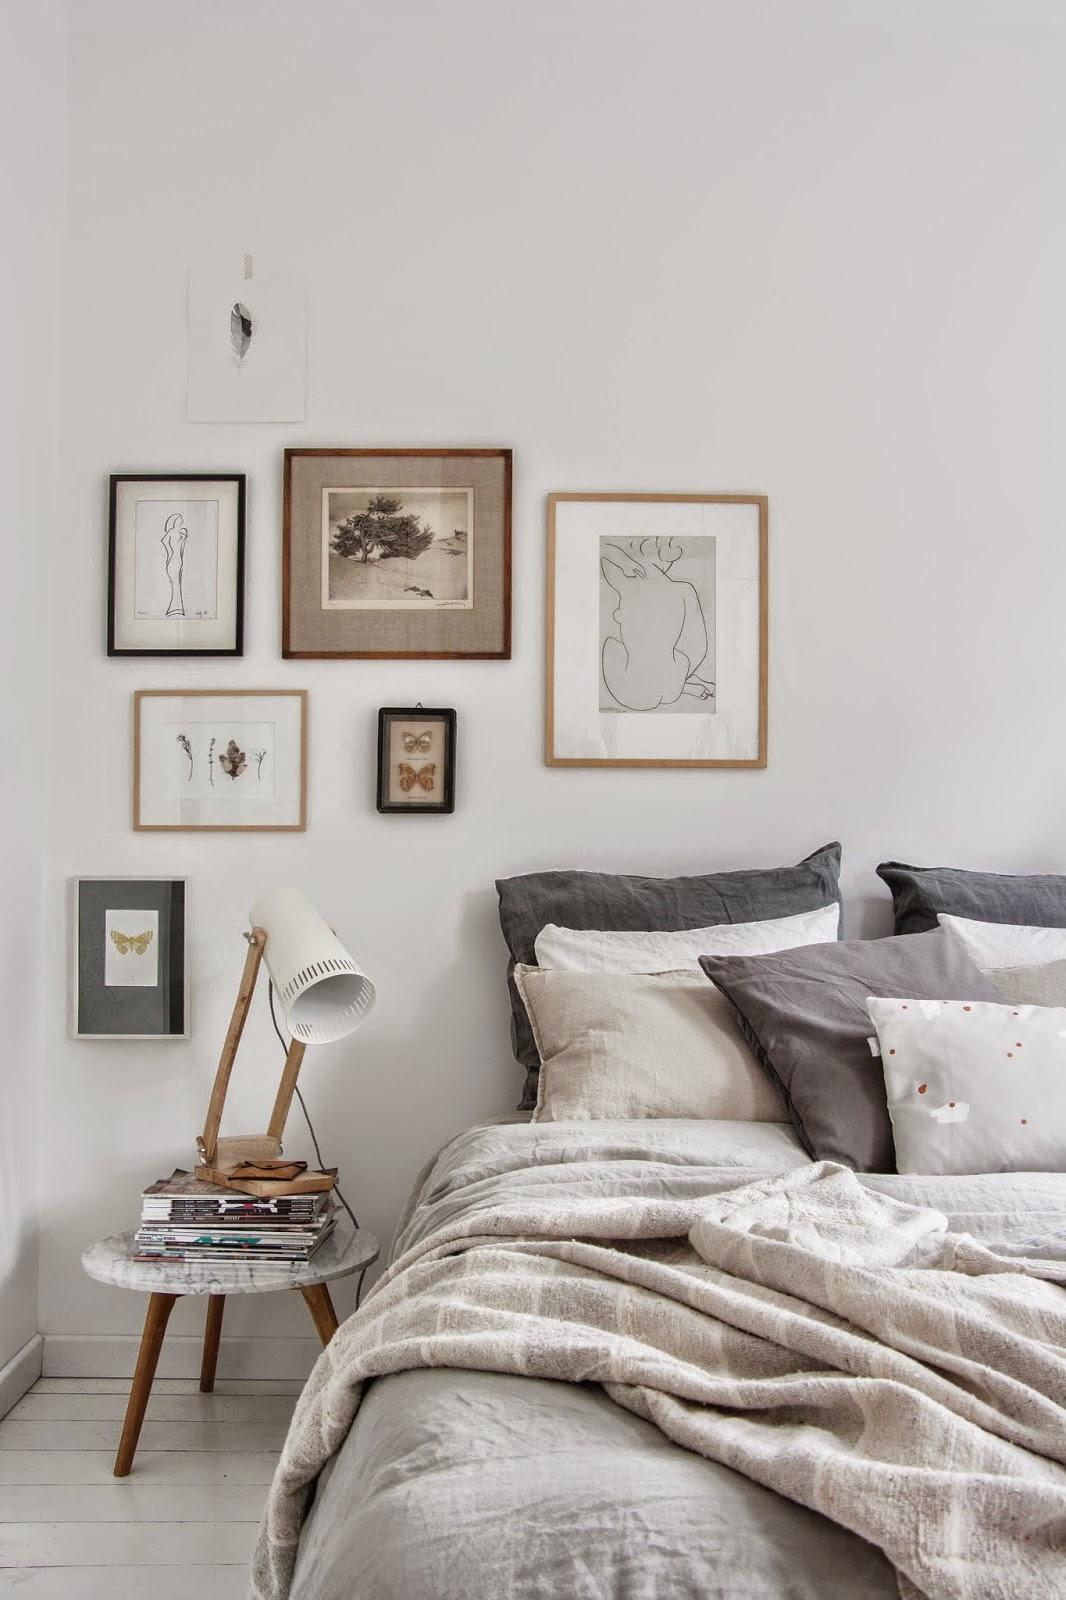 dormitorio_estilo_nórdico_virlovastyle01